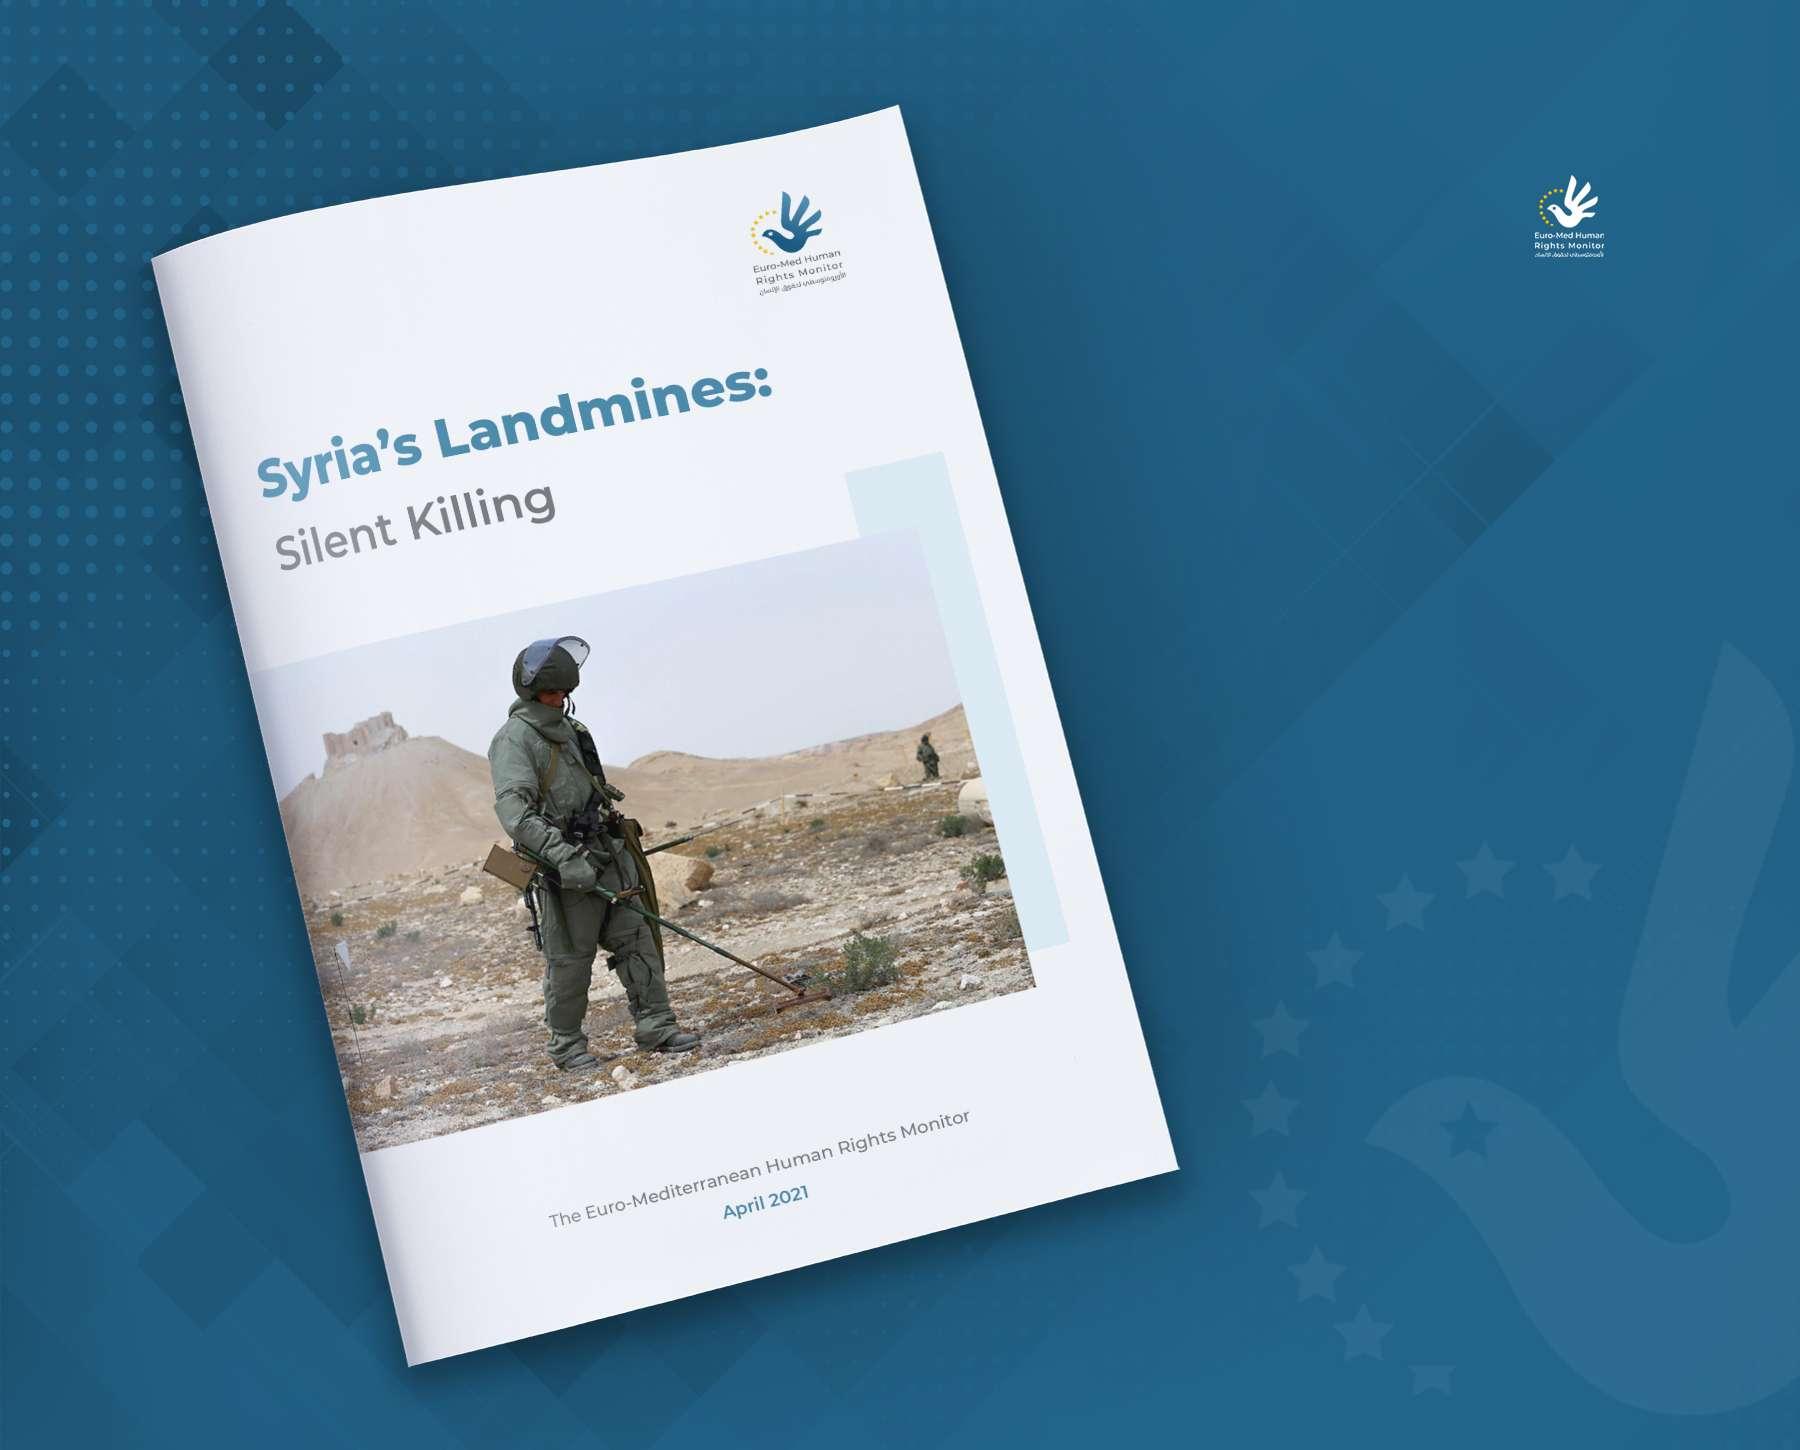 Syria's Landmines: Silent Killing